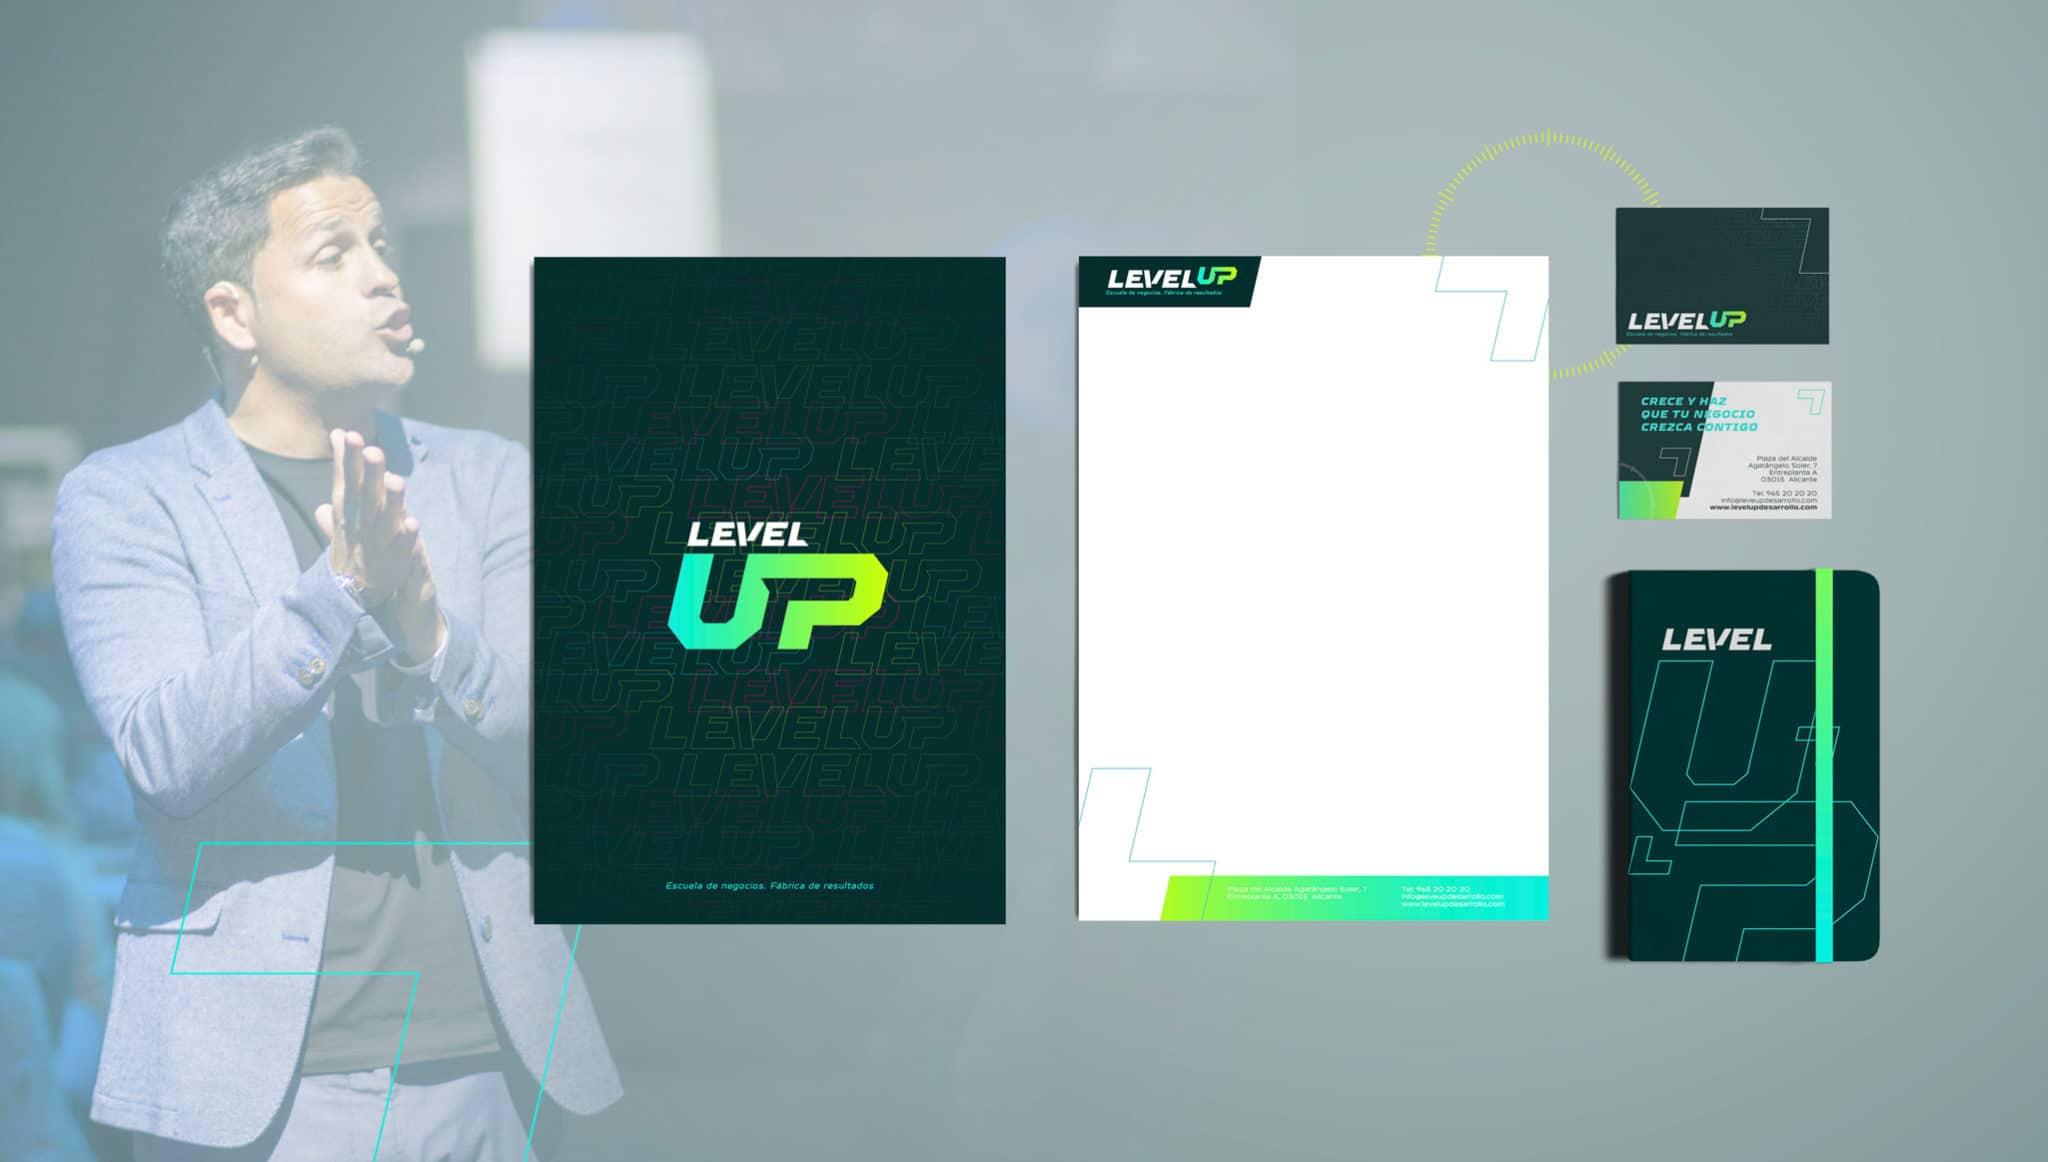 Stationery LevelUP Identidad Corporativa alicante 1 scaled